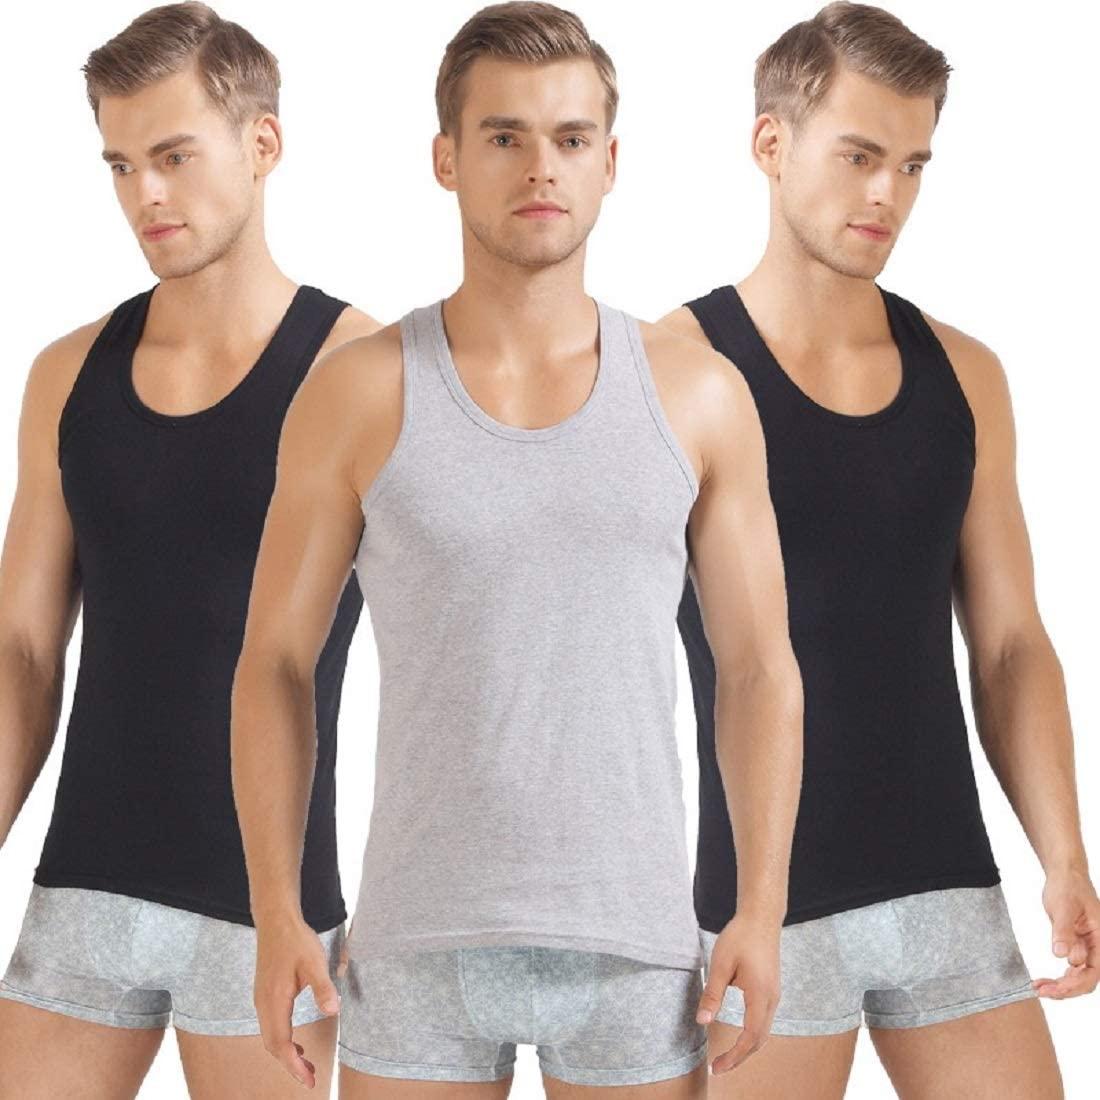 MIXZONES Mens 100% Cotton Ribbed Tank Tops Sleeveless Crewneck A-Shirts Basic Solid Undershirts Vests 3 Pack